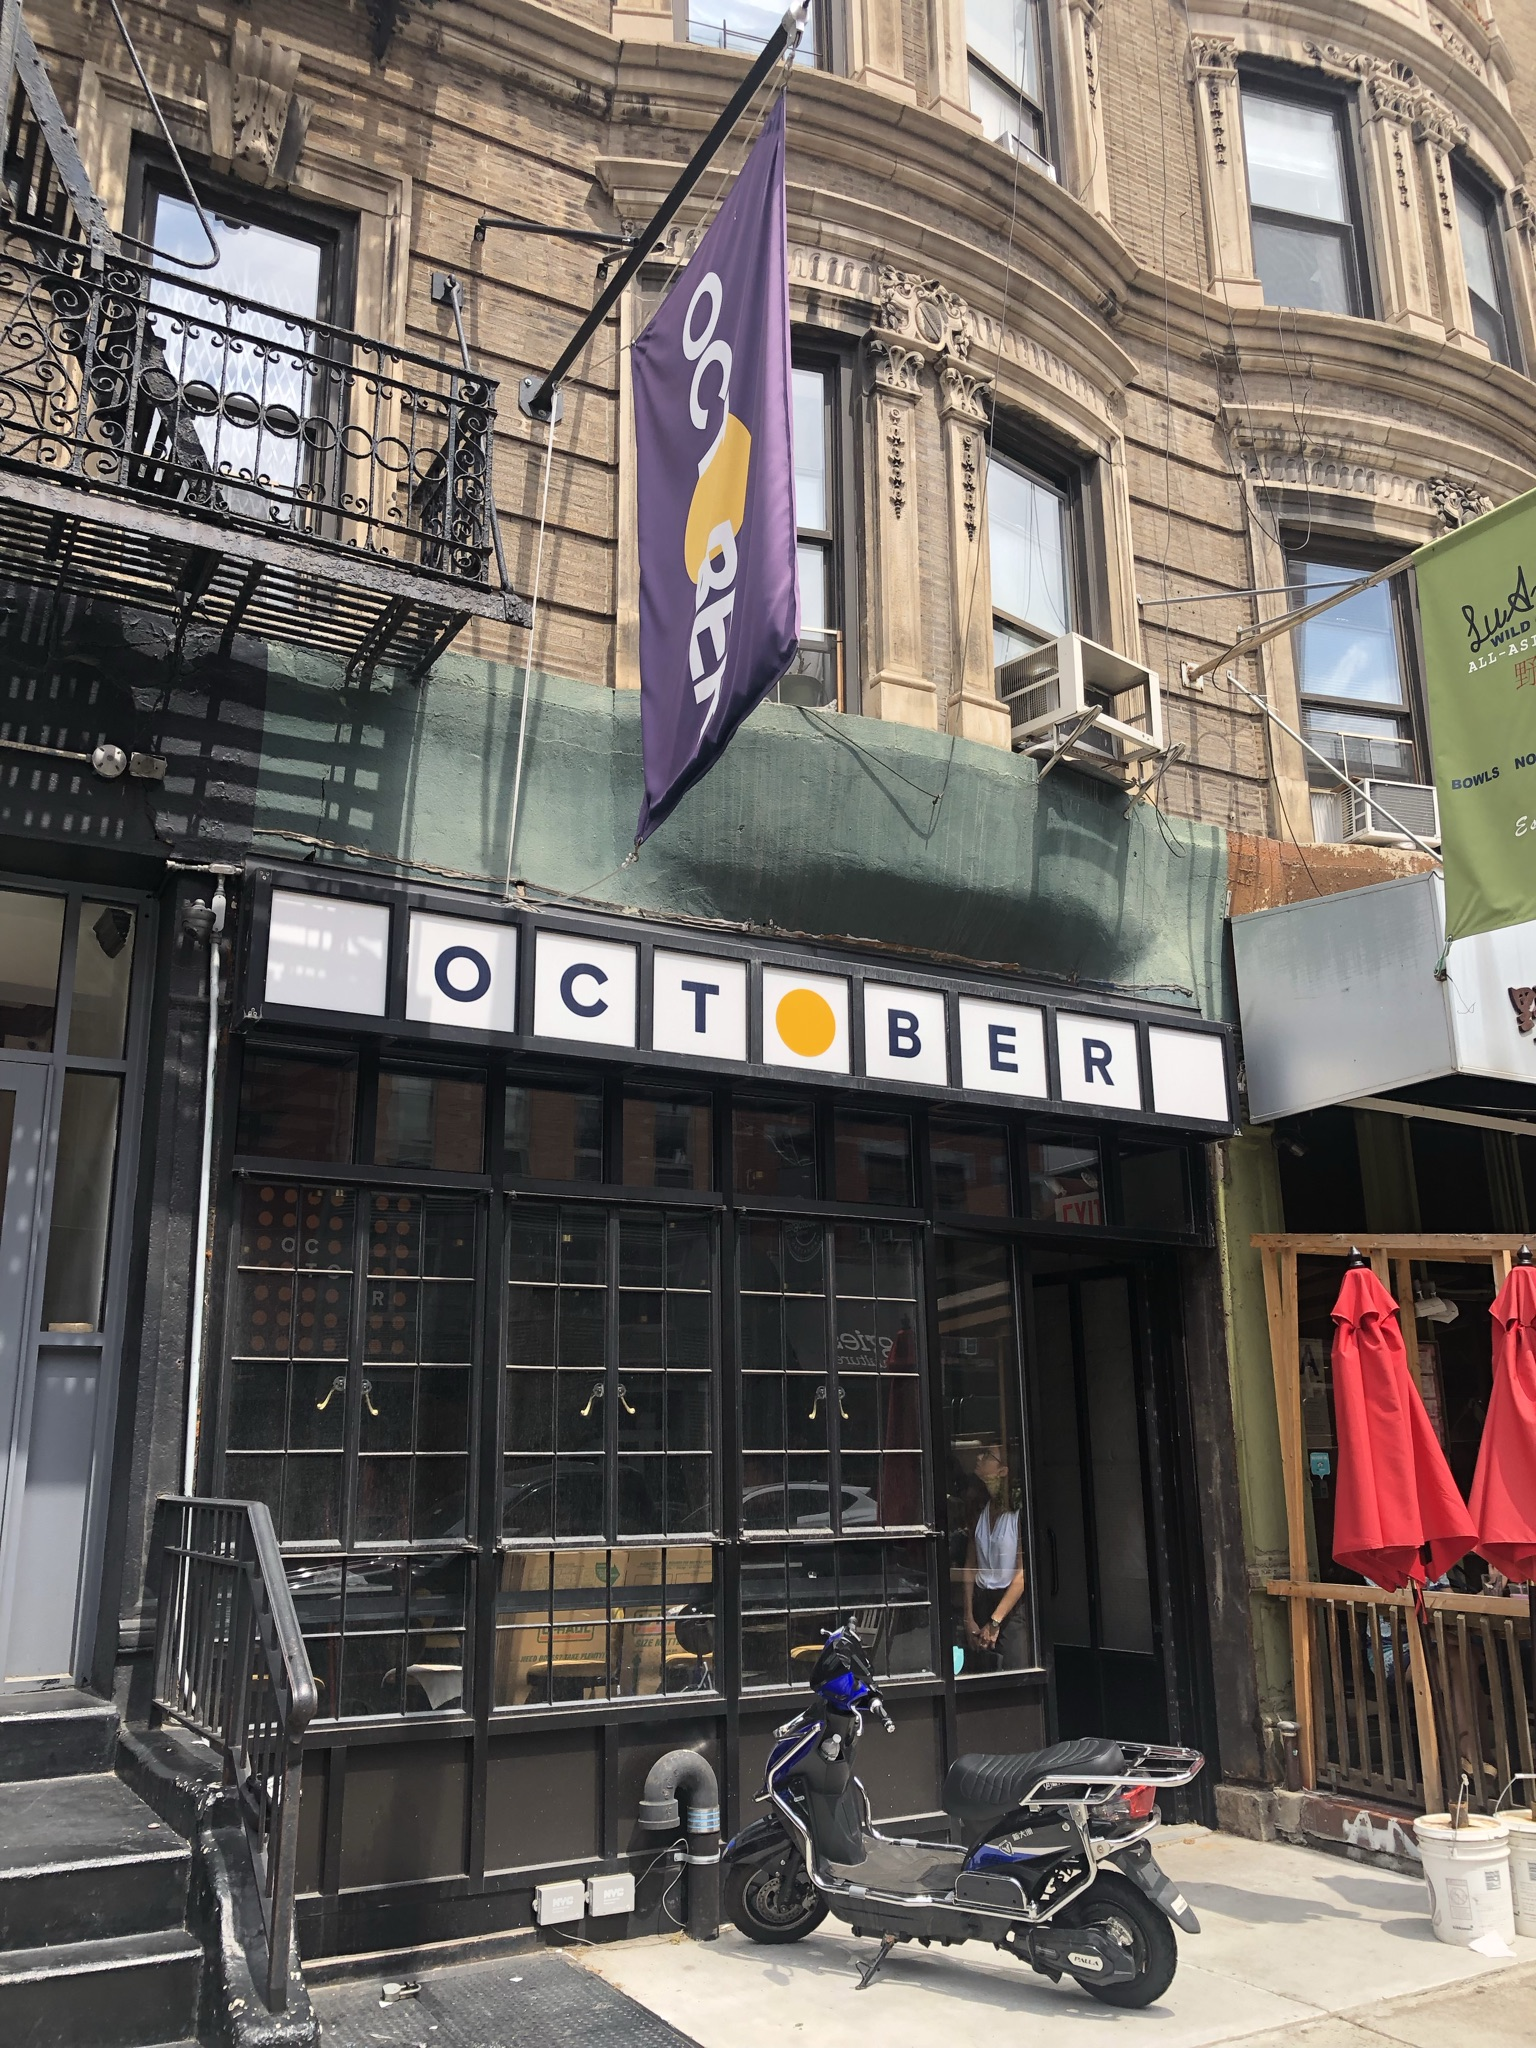 New Listing – Restaurant/QSR Opportunity in NoLita